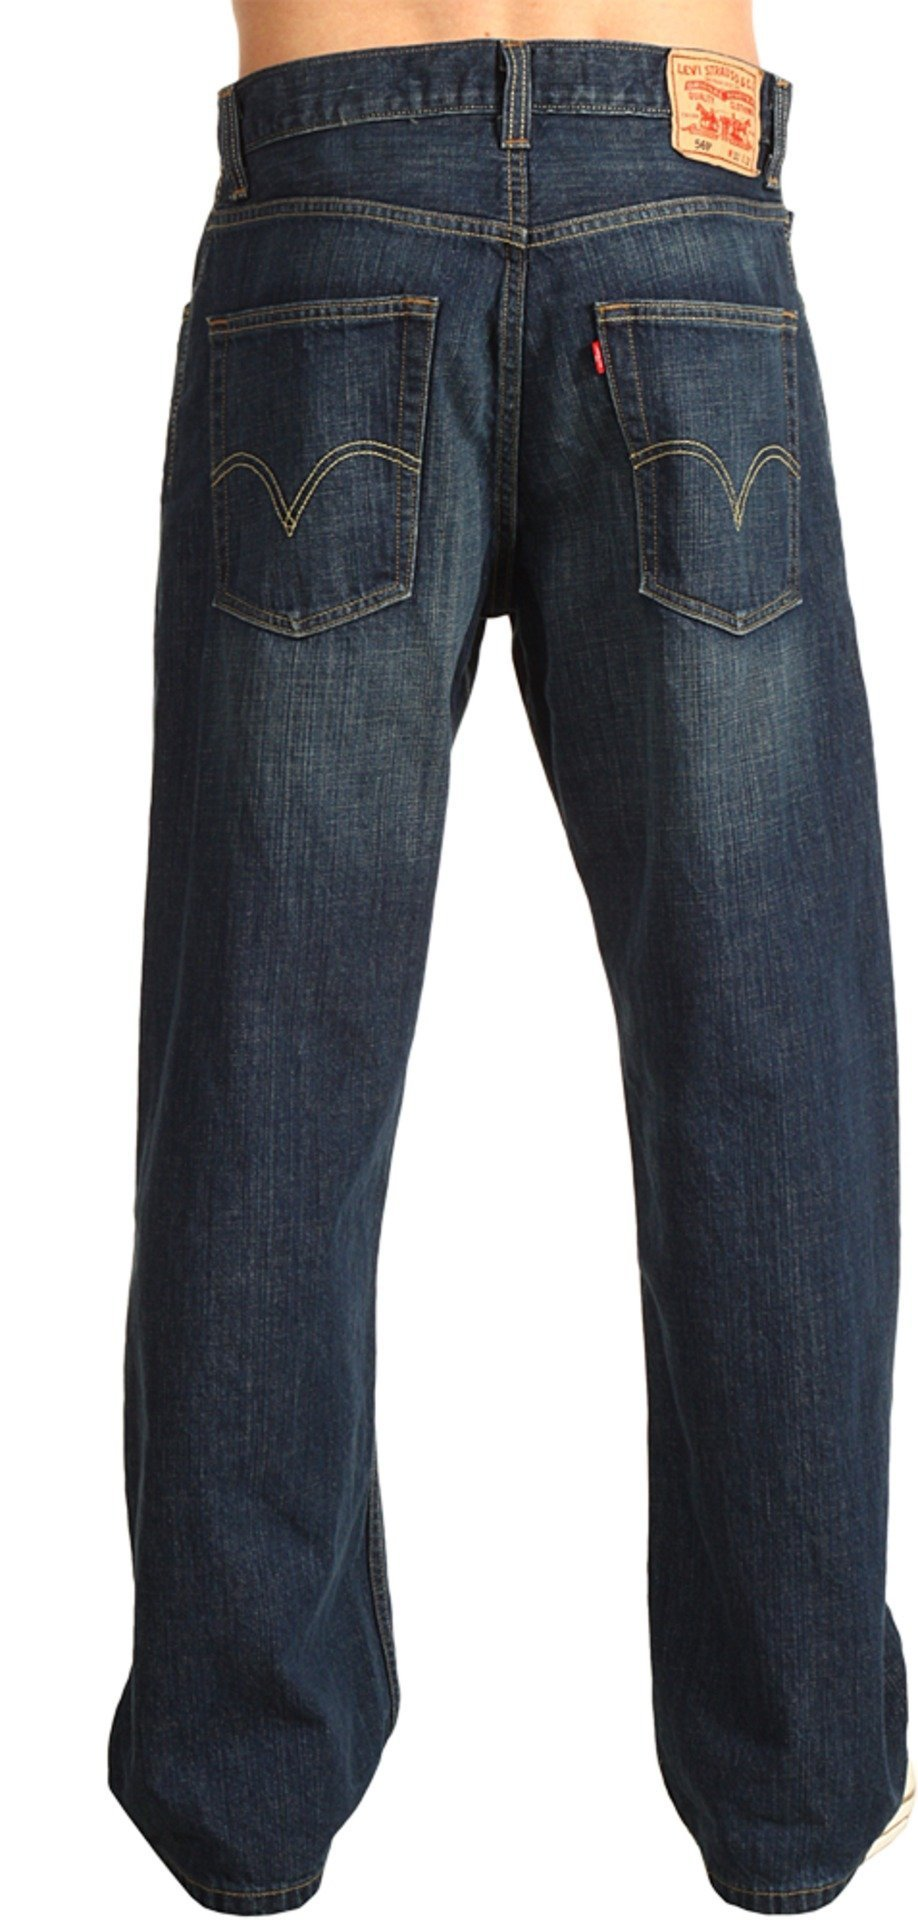 Levi's  Men's 569 Loose Straight Jean, Dark Chipped, 36x30